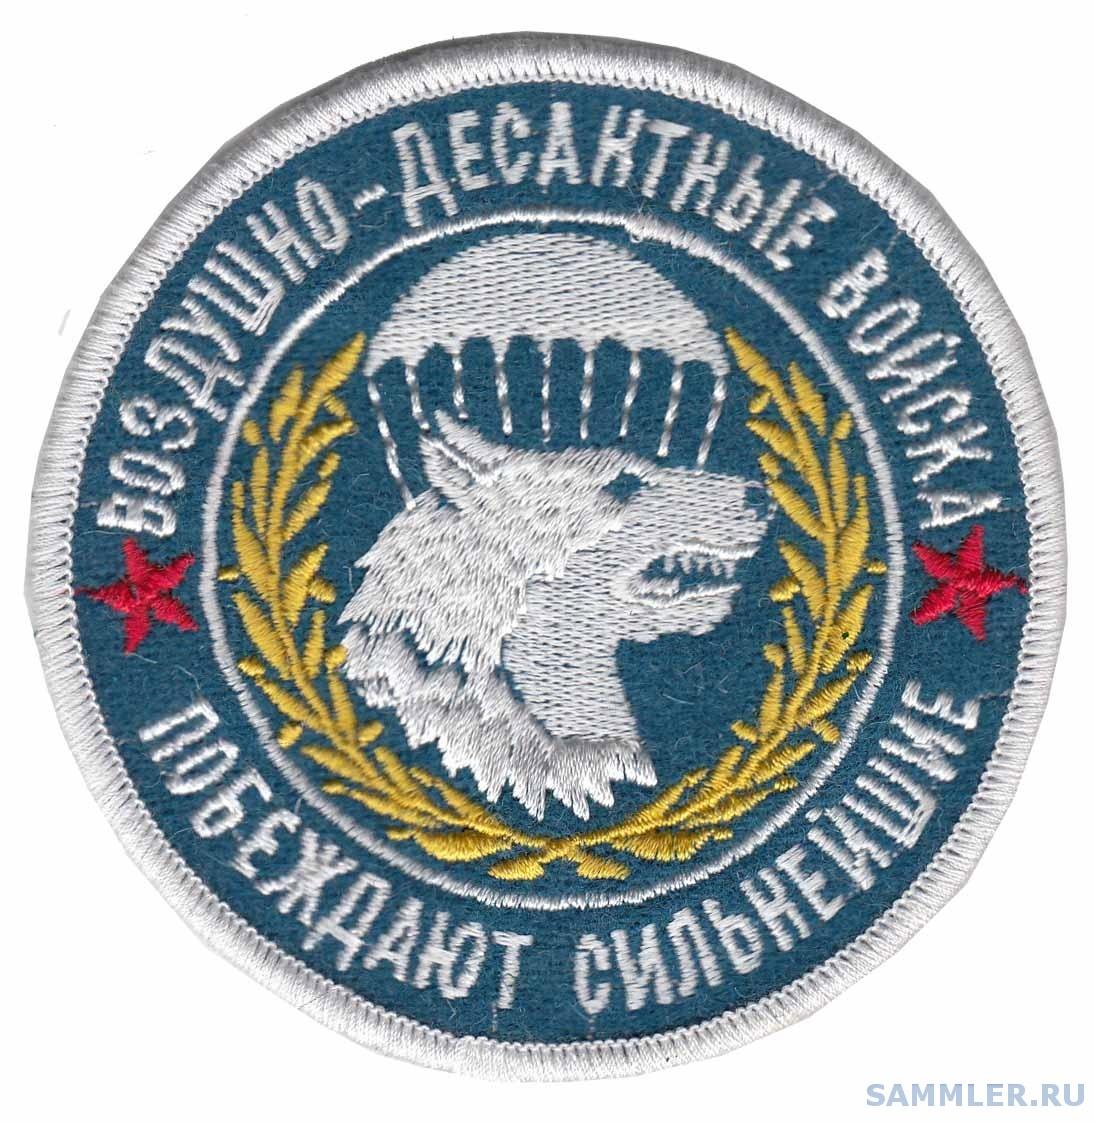 45 полк спец. назначения_0007.jpg